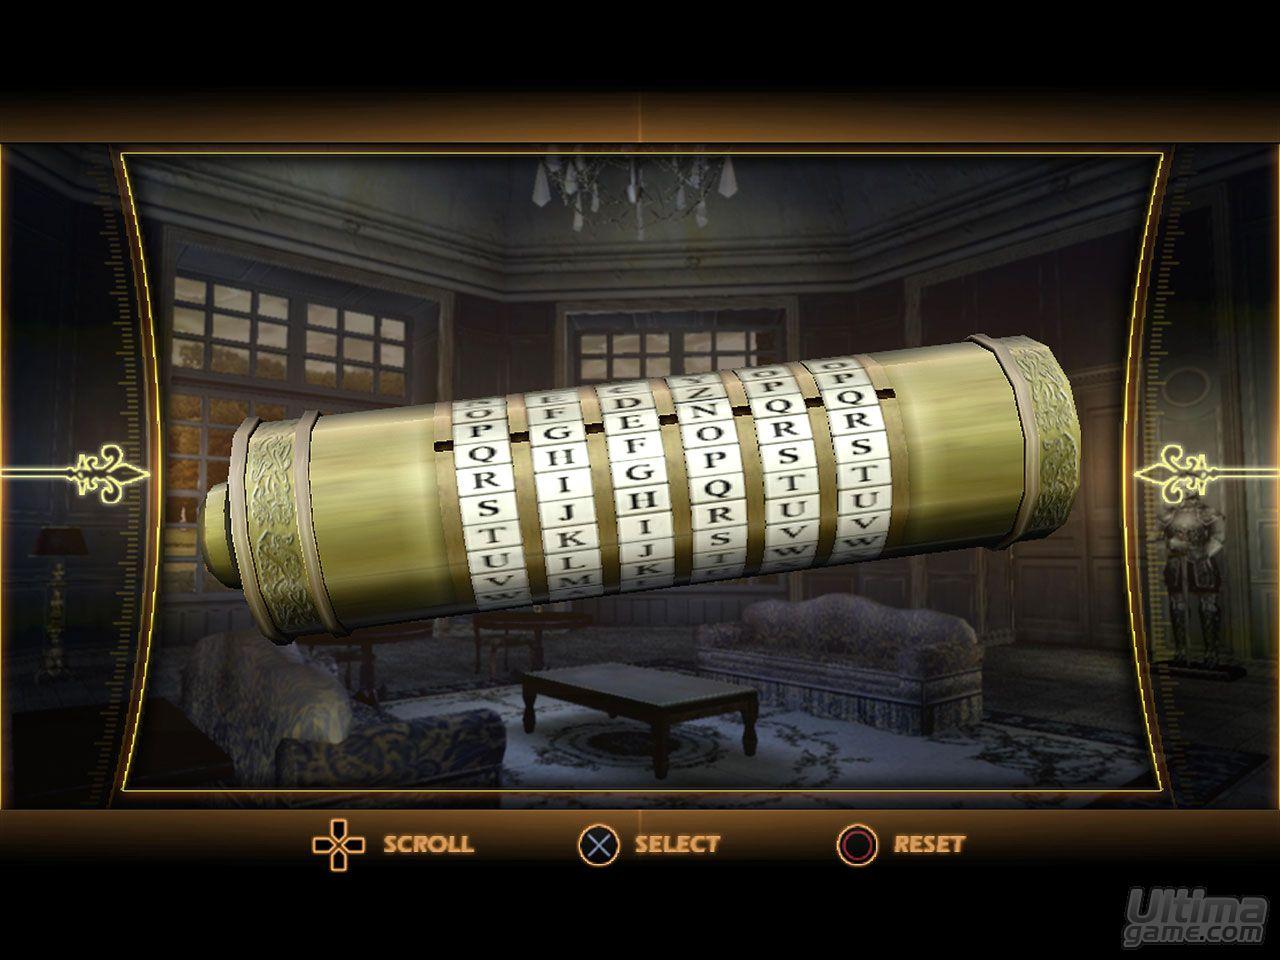 juego ps2 codigo davinci: